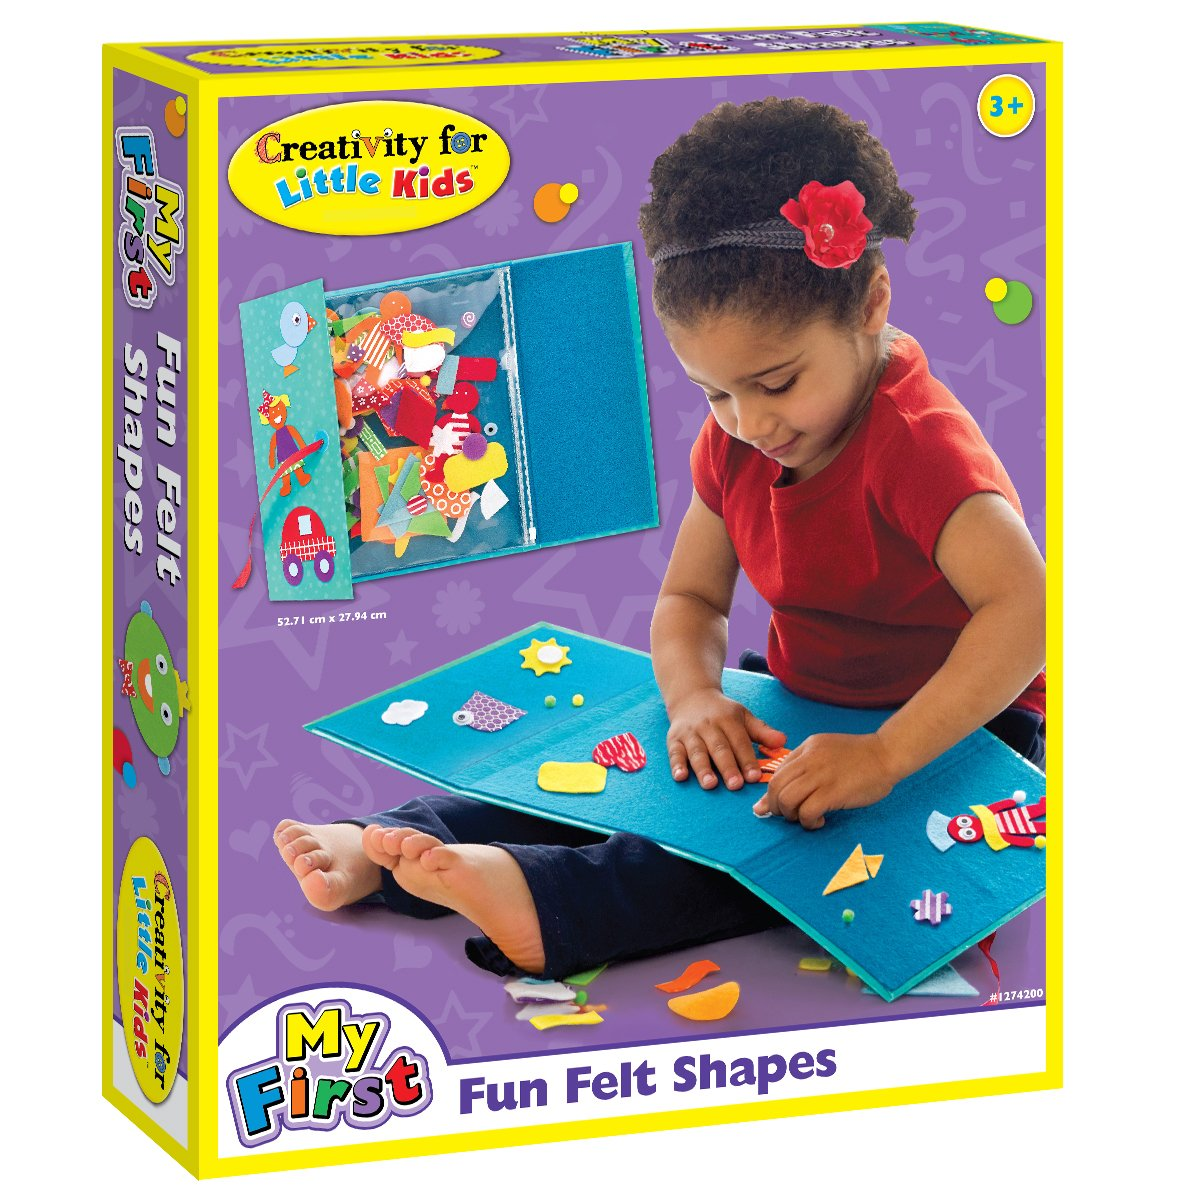 Creativity for Kids My First Fun Felt Shapes - Portable Felt Board for Preschoolers by Creativity for Kids